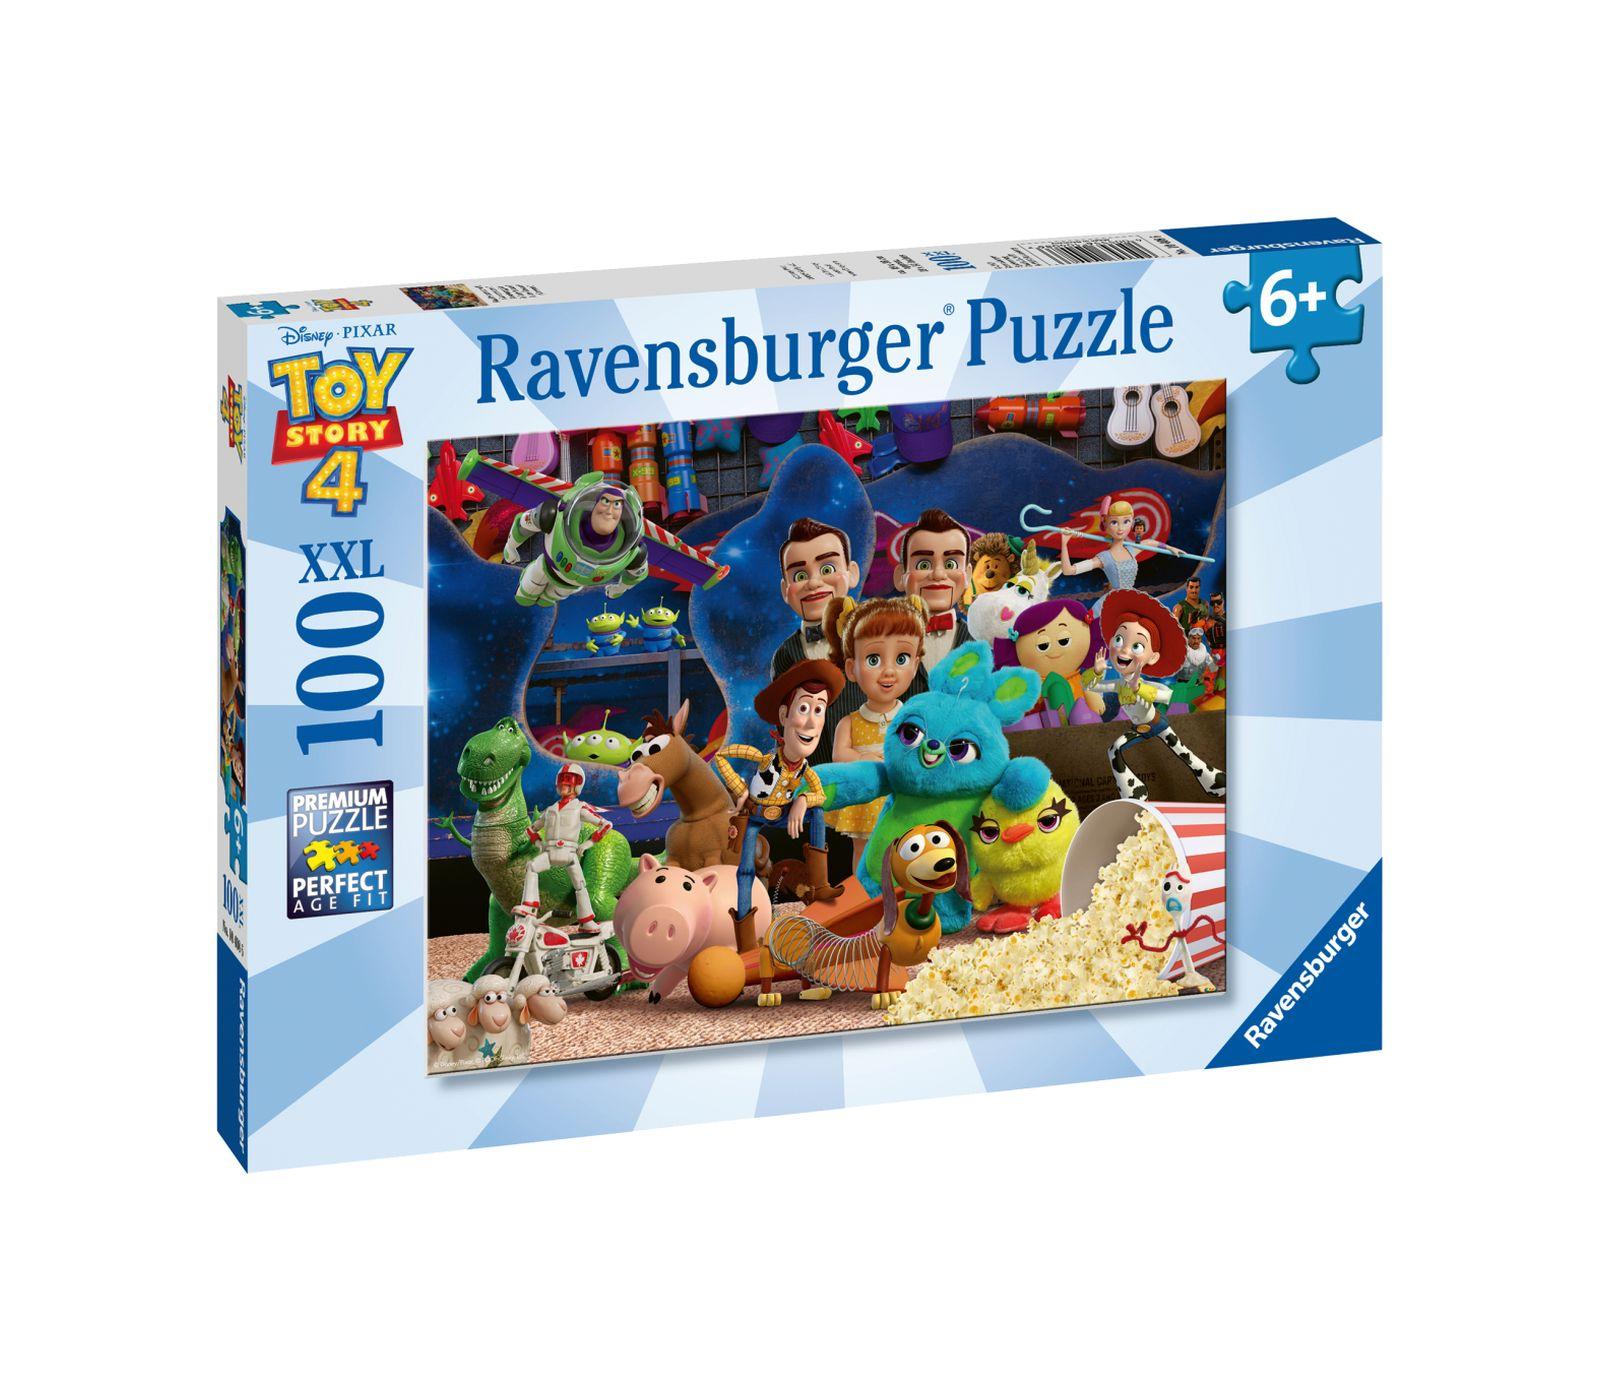 Ravensburger - puzzle 100 pezzi xxl - toy story 4 - Ravensburger1, TOY STORY